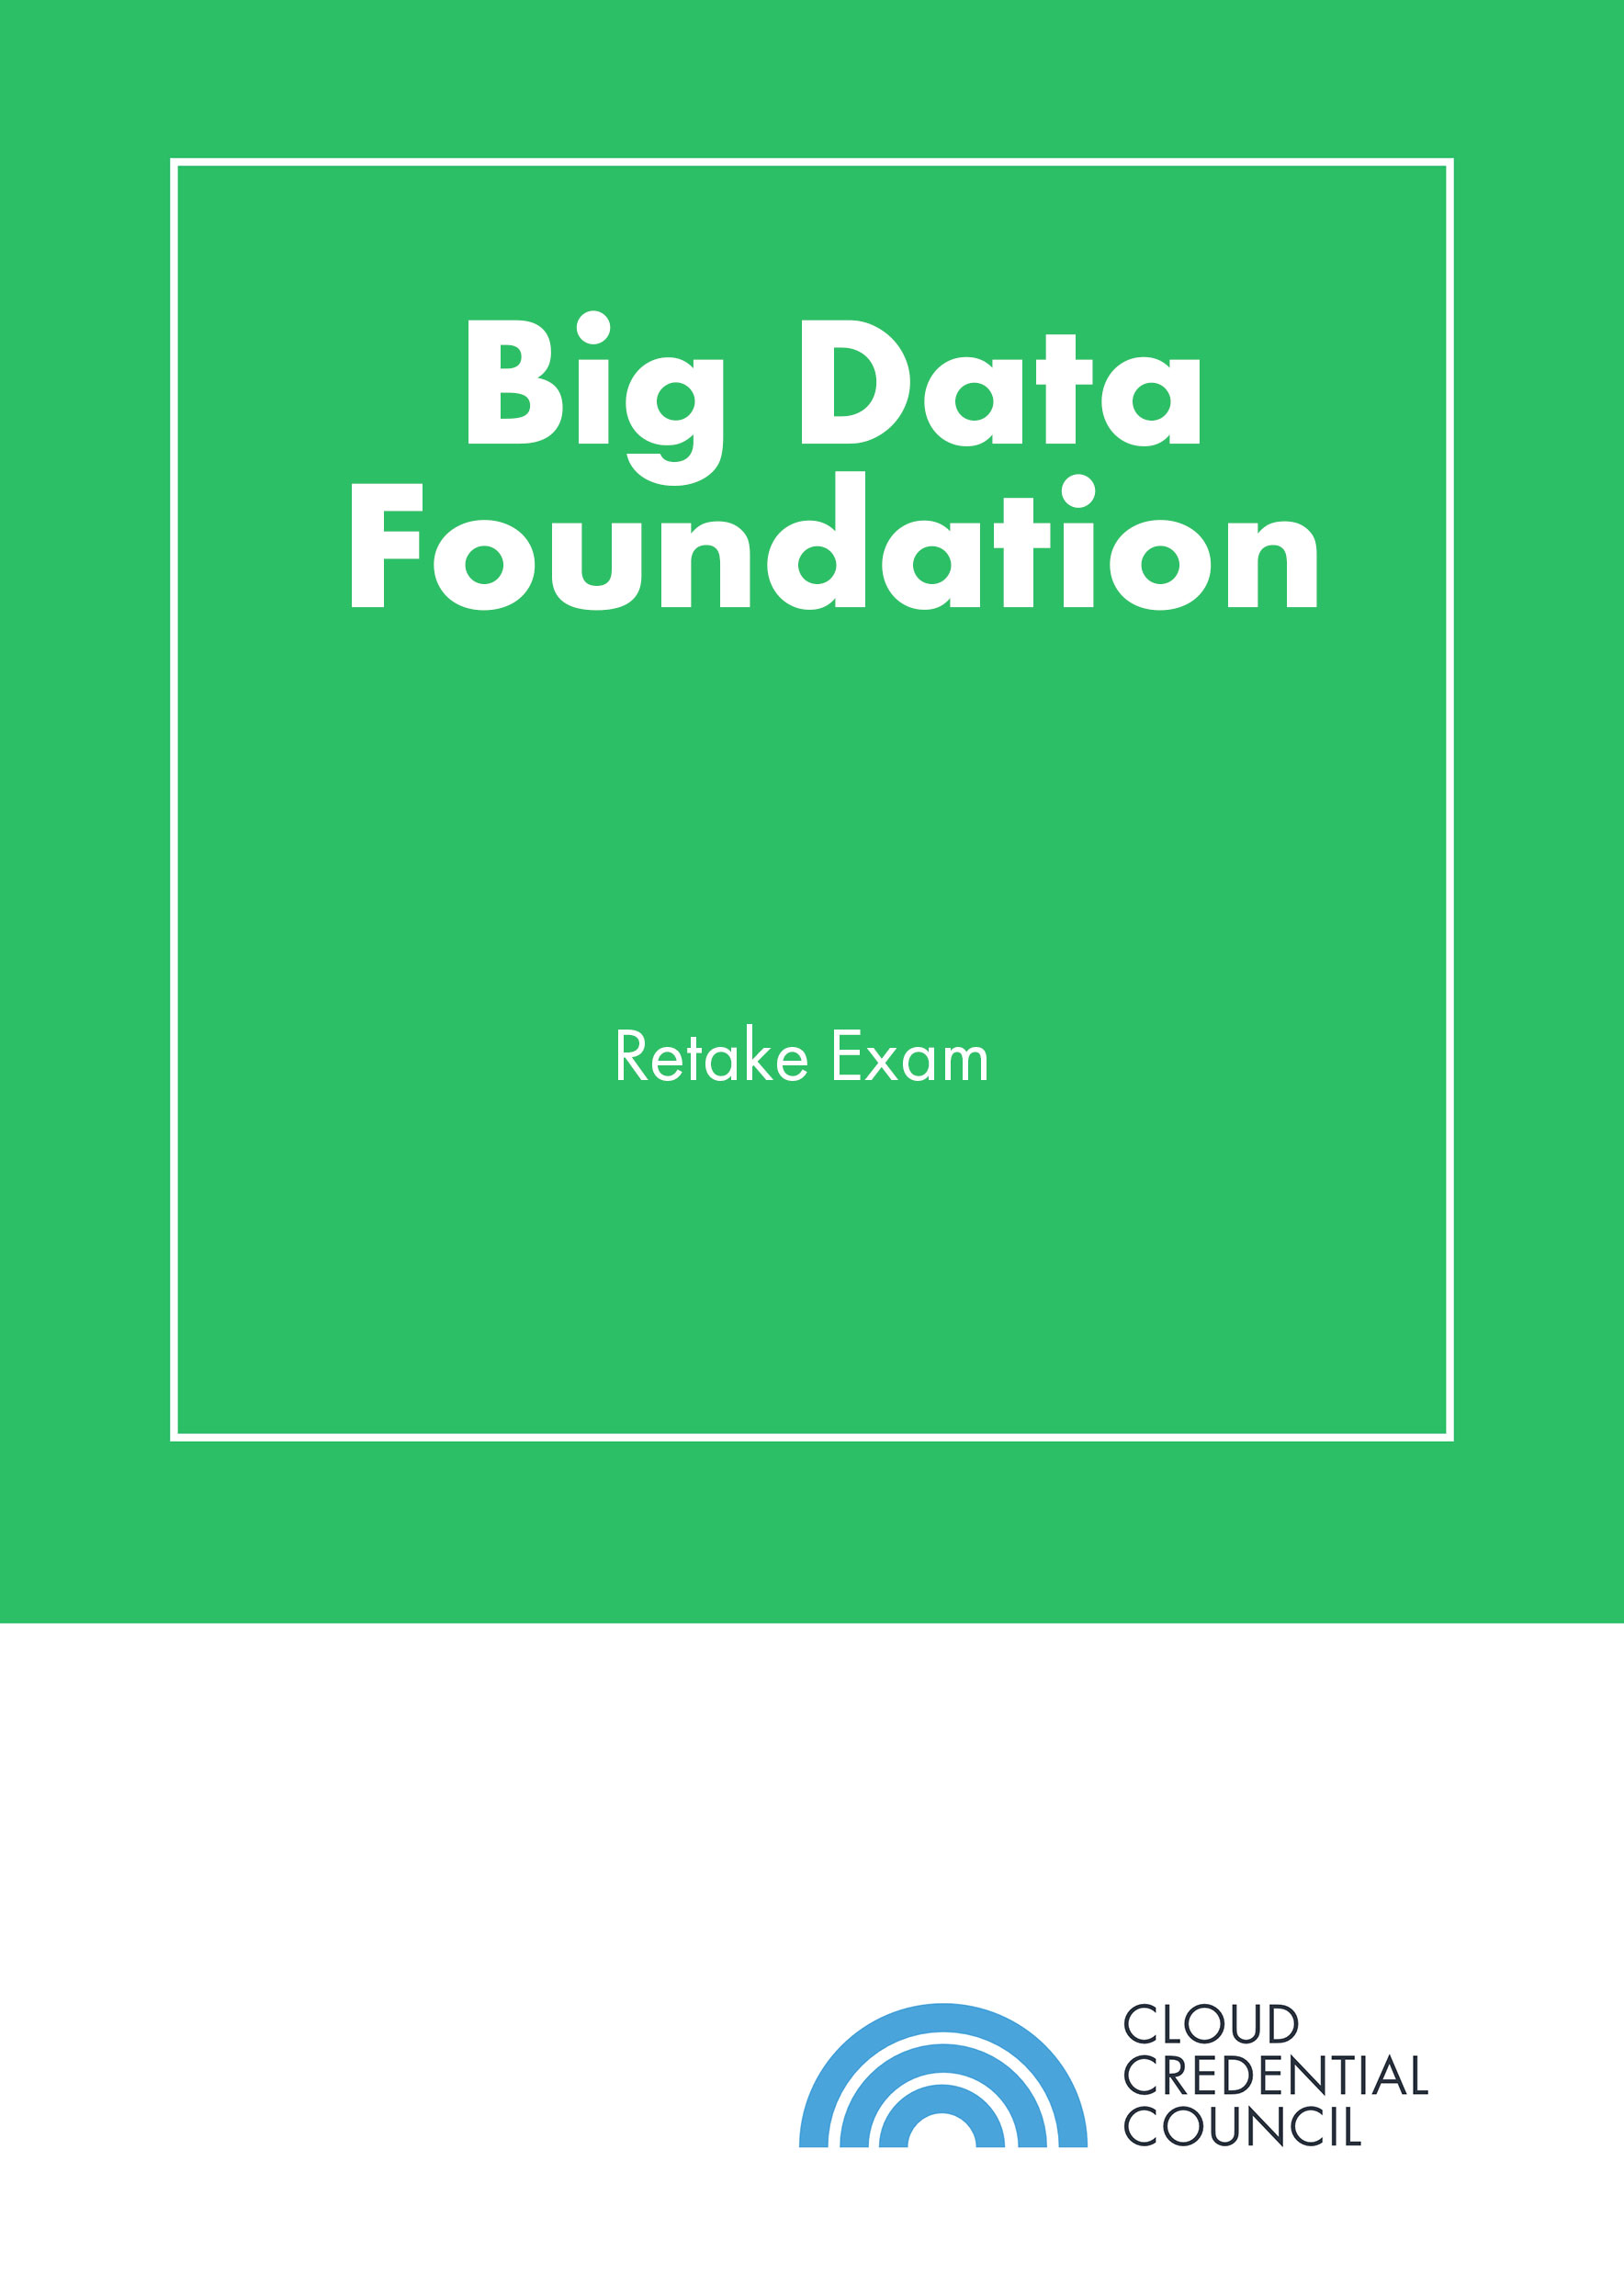 Big-Data-Foundation-Retake